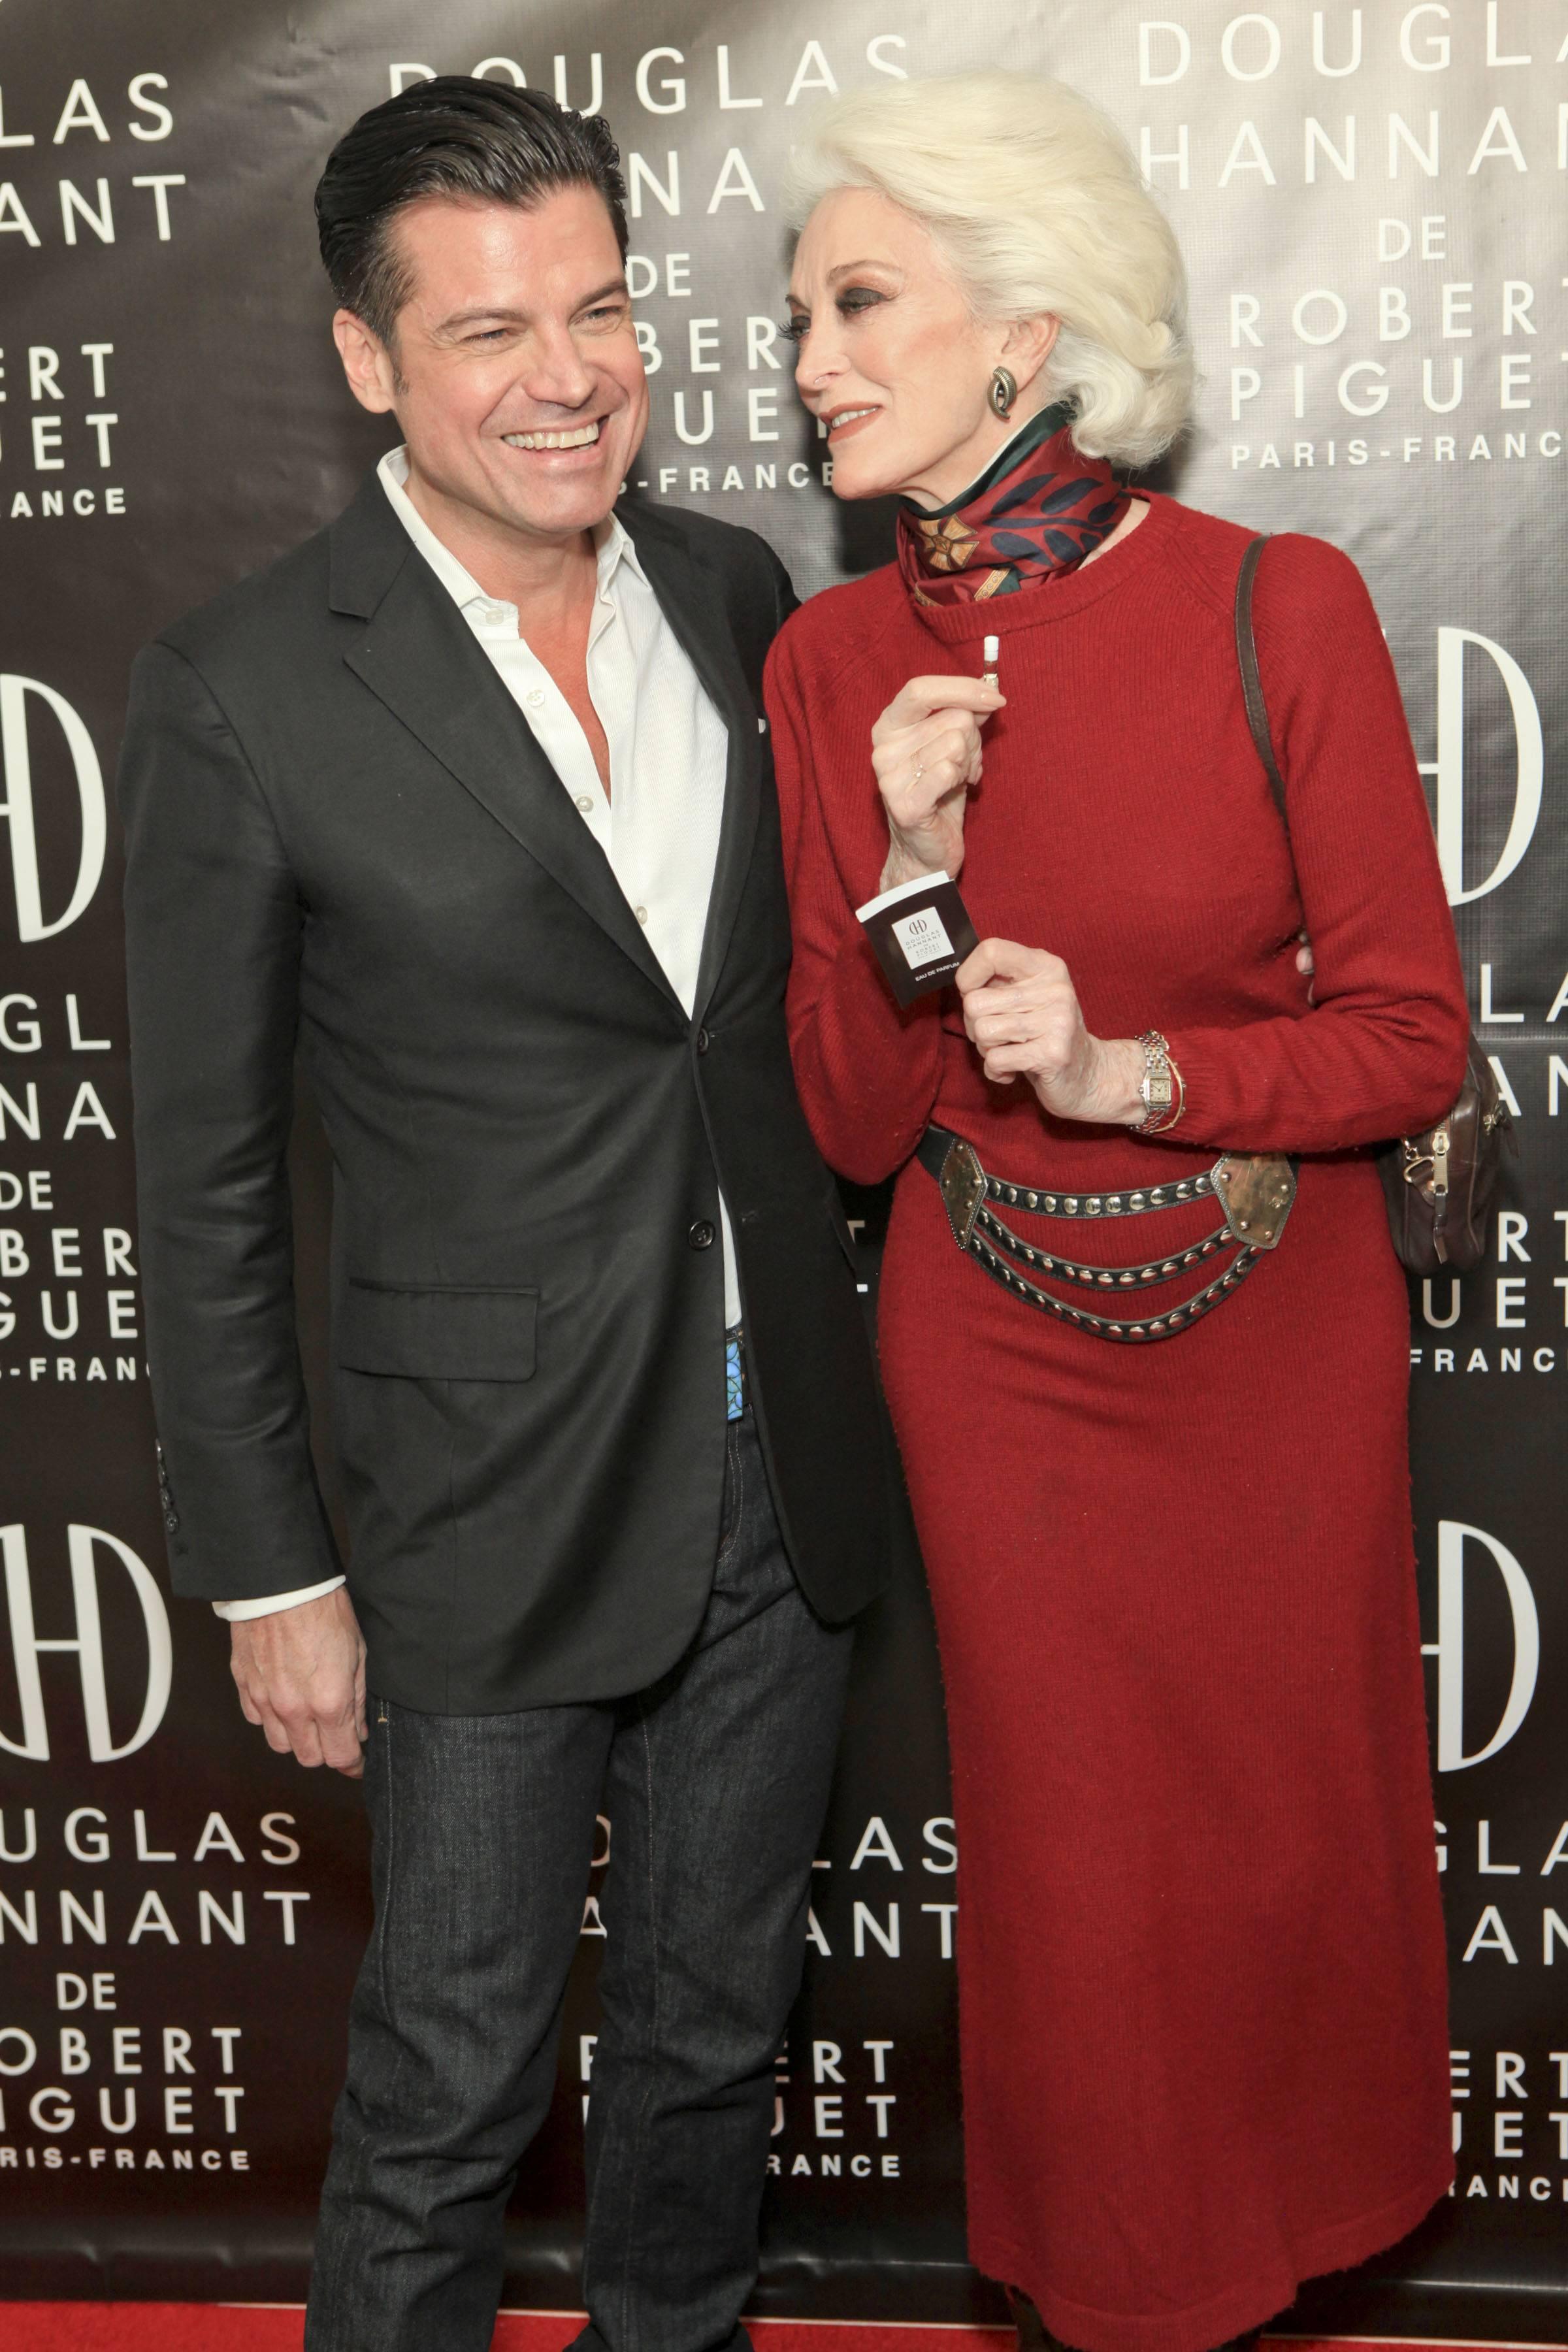 Douglas Hannant, Carmen Dell'Orefic